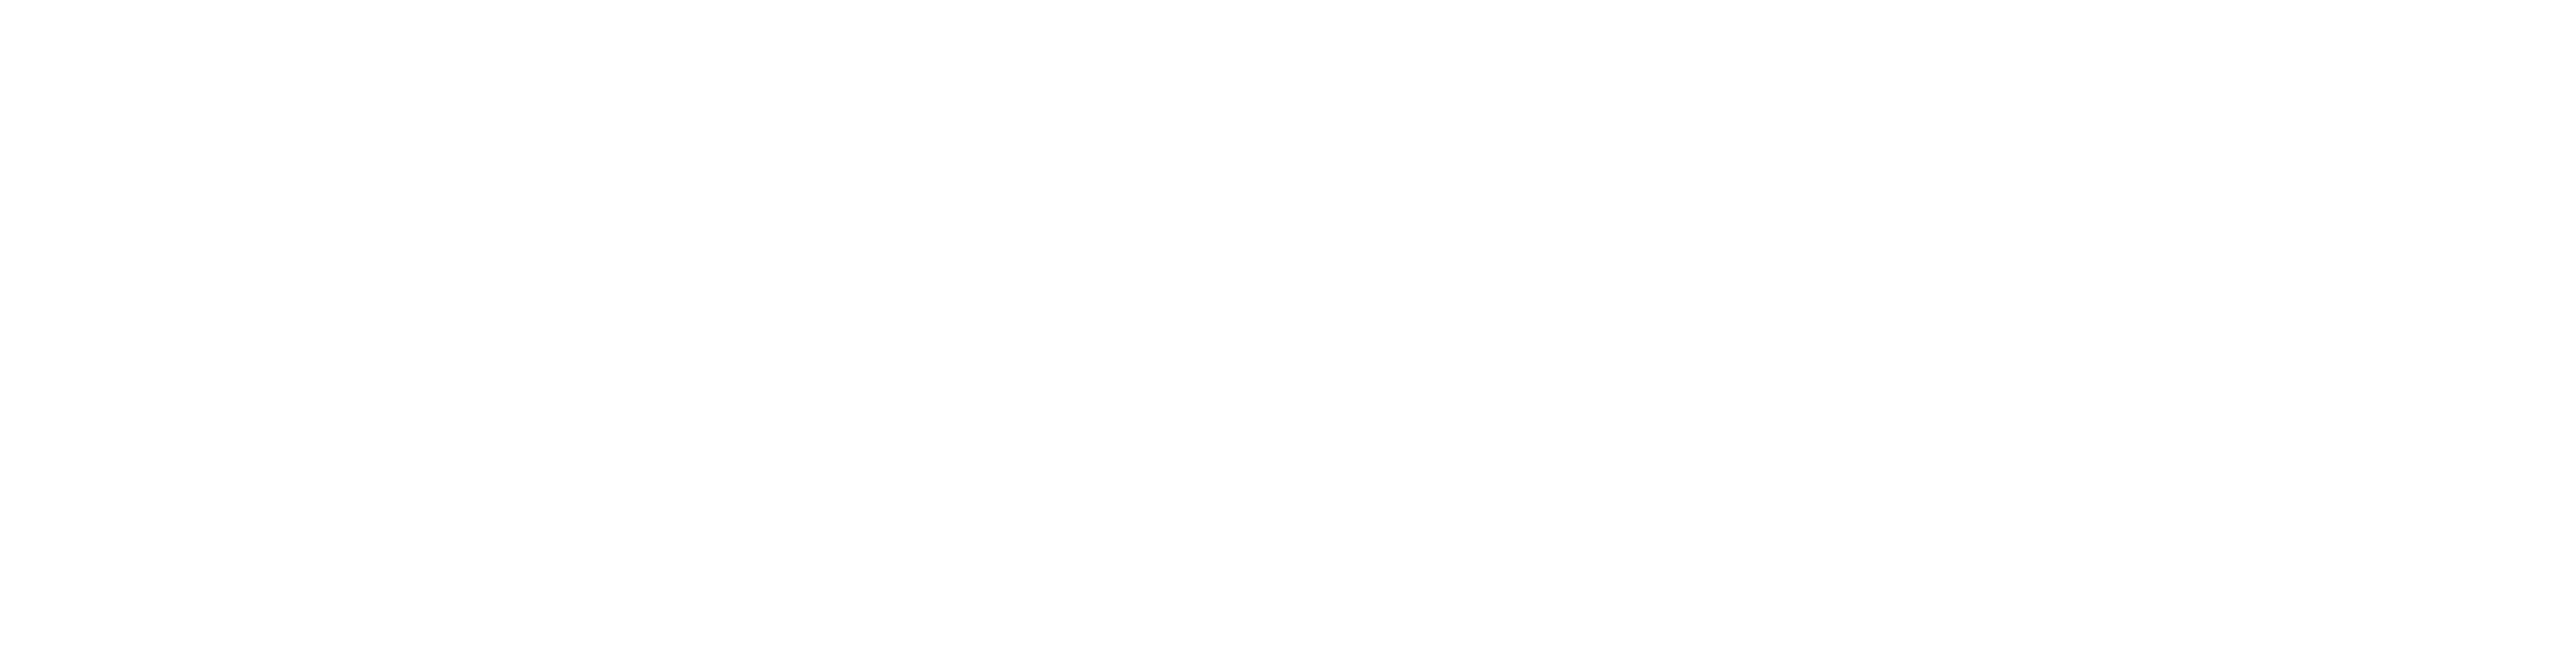 Transparent background (white logo)